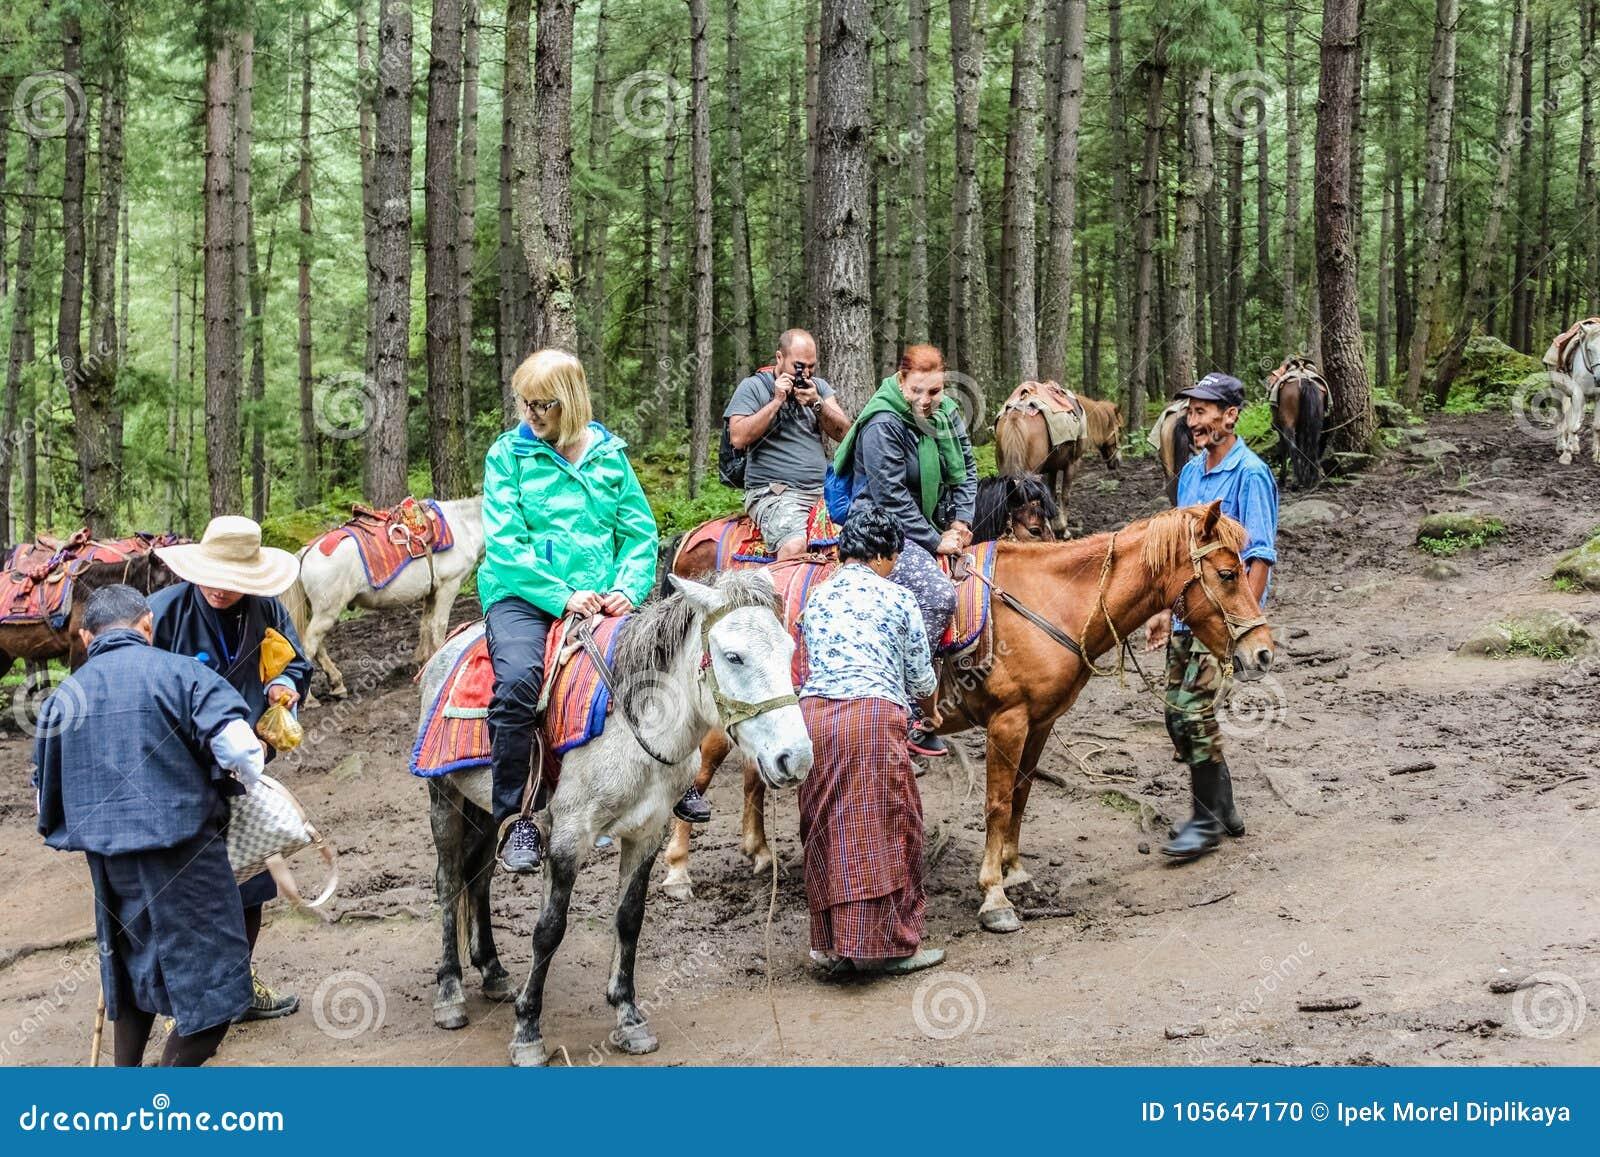 Paro, Μπουτάν - 18 Σεπτεμβρίου 2016: Τουρίστες στα άλογα προς το μοναστήρι Taktshang Palphug (η φωλιά της τίγρης), Μπουτάν